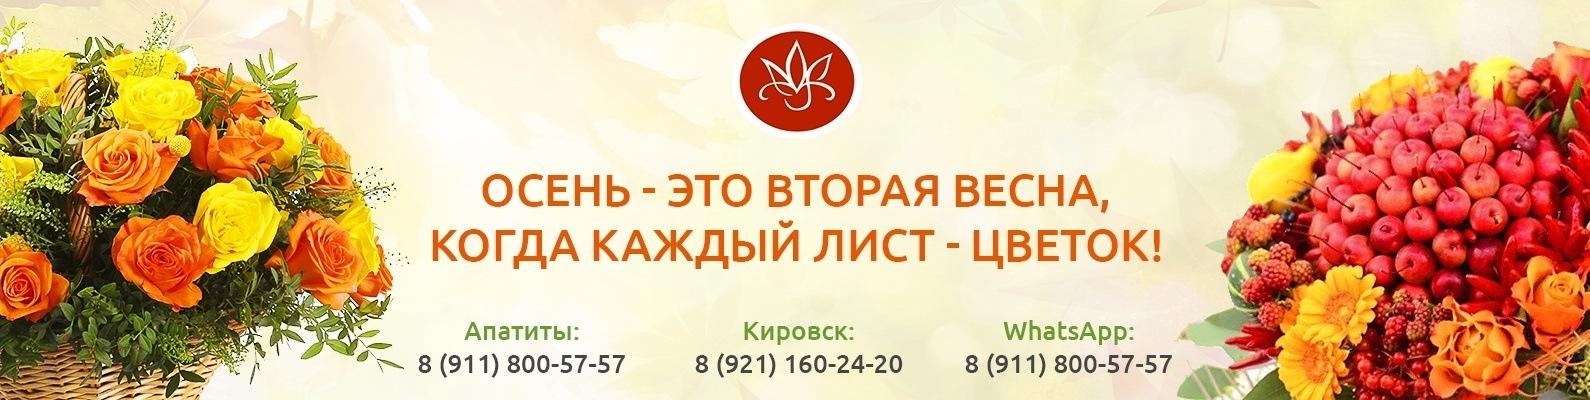 Заказ цветов апатиты с доставкой